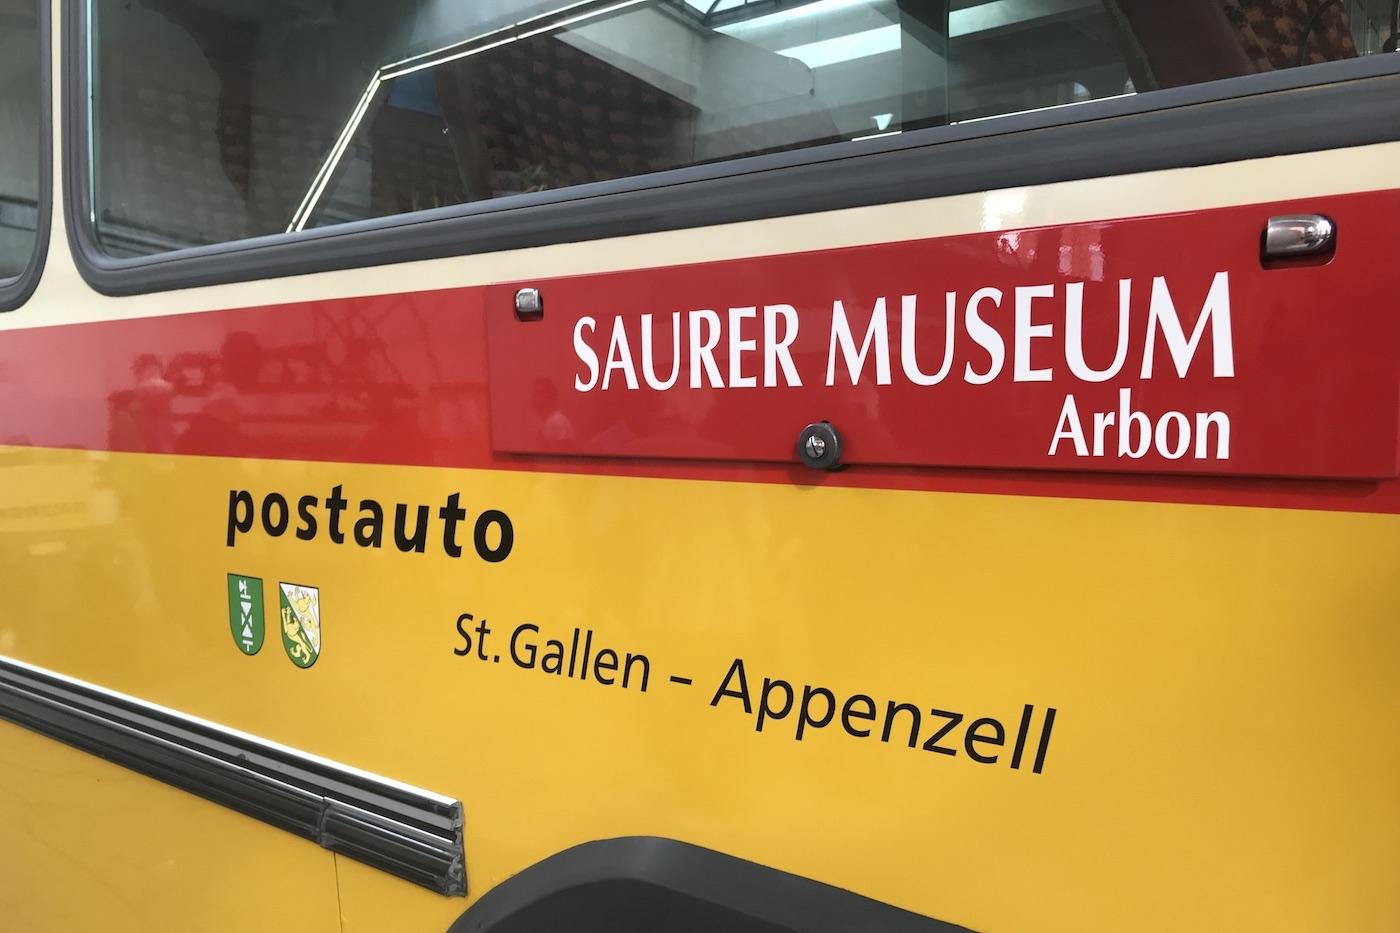 Saurer Museum, Arbon